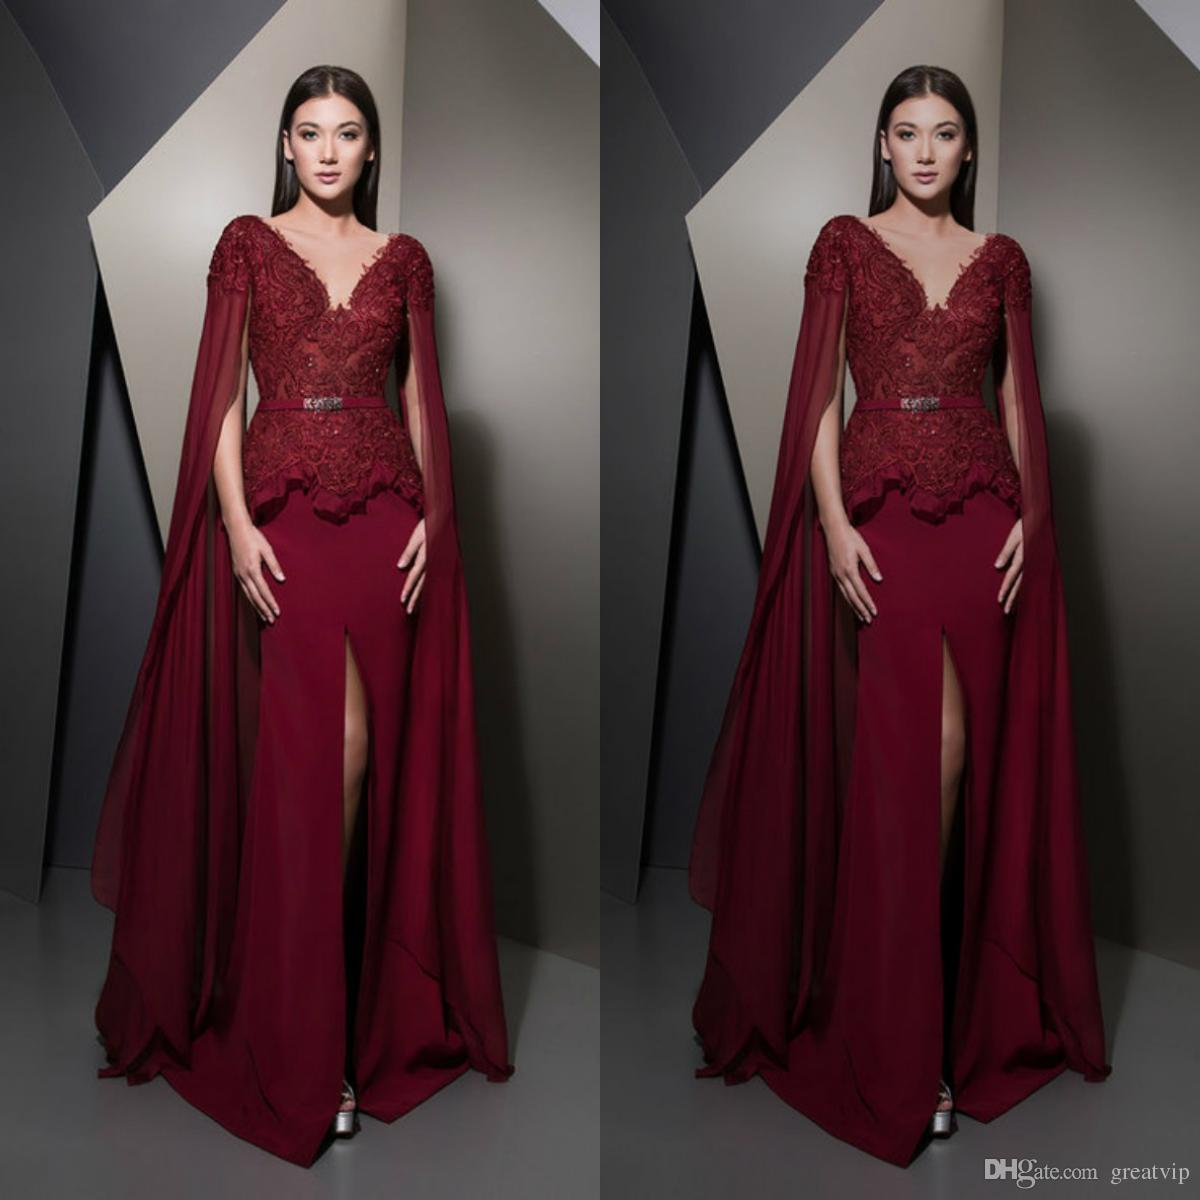 34b84c0151ebc 2019 Dark Red Evening Dresses V Neck Lace Beads Sash Long Sleeve Split Prom  Gowns Plus Size Bridesmaid Party Dress Vestidos De Noiva Sparkly Evening  Dresses ...